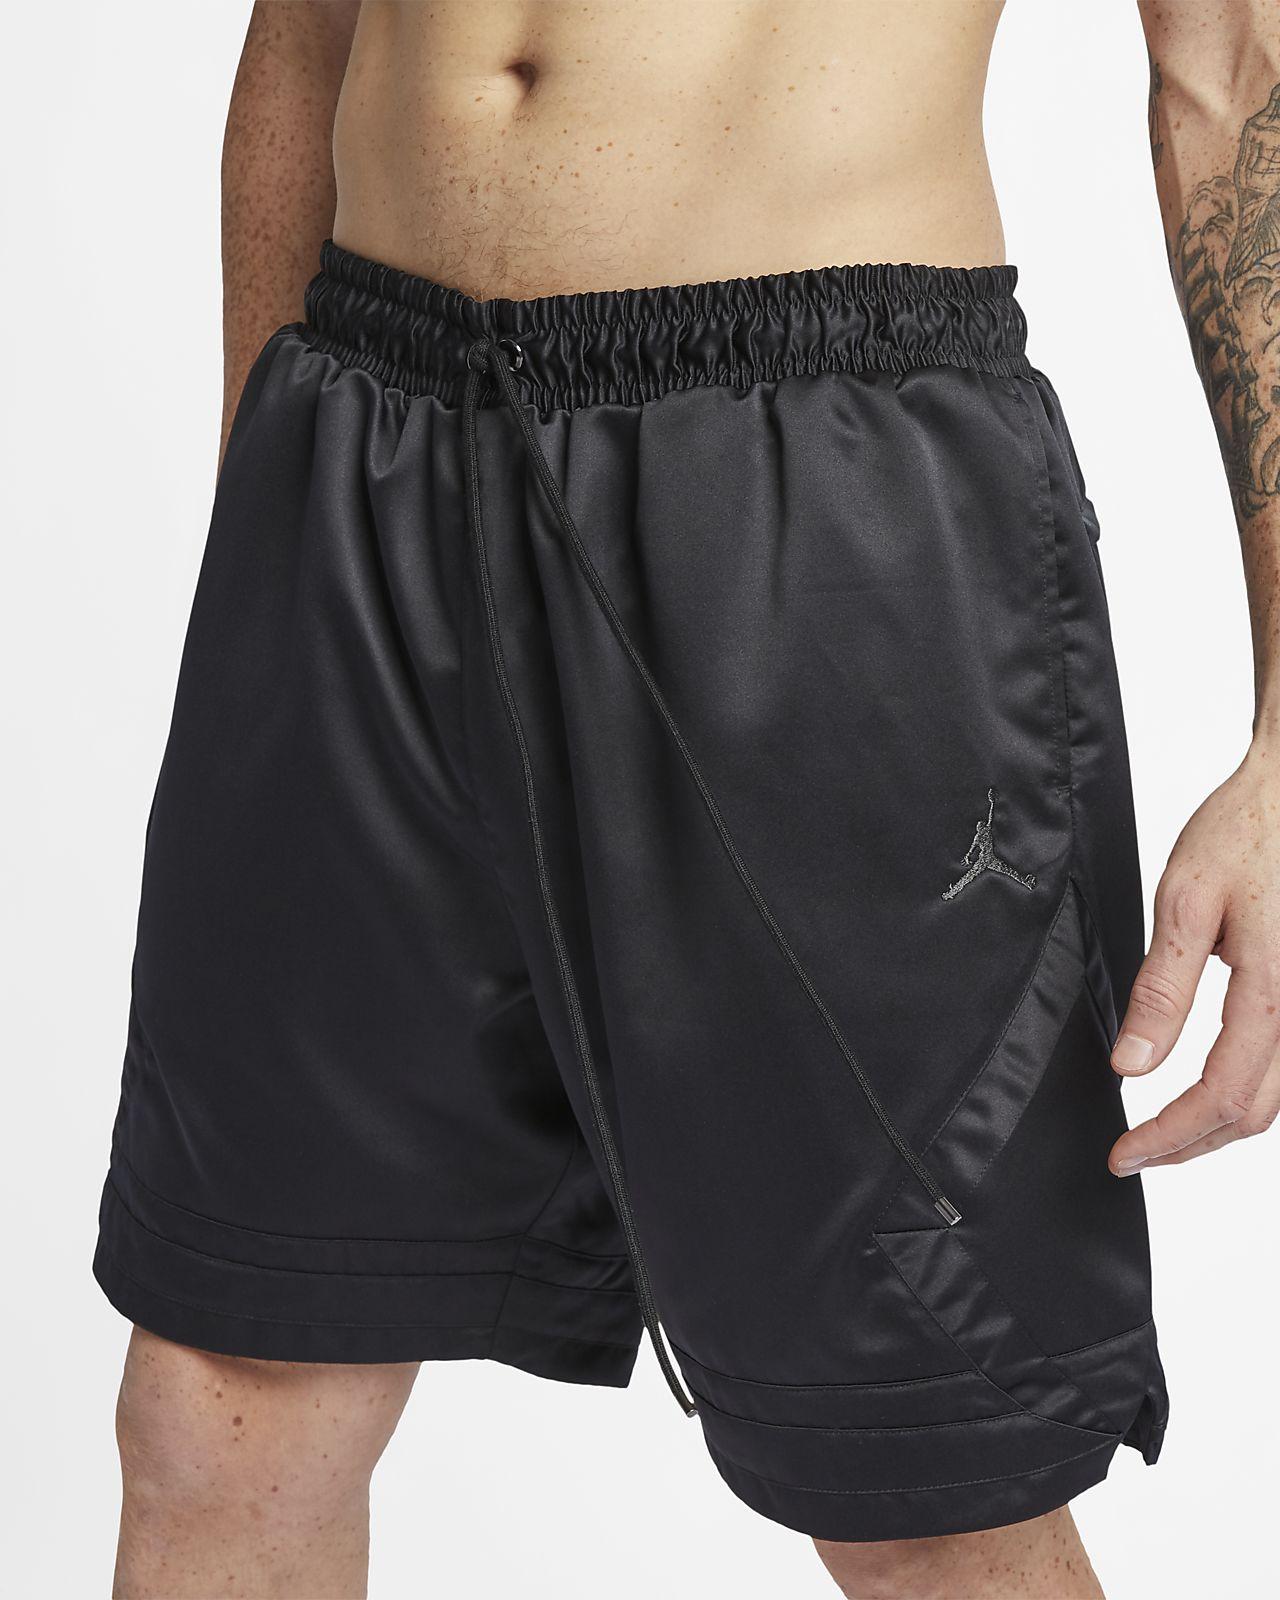 3fb1324dcdd15b Jordan Satin Diamond Men s Shorts. Nike.com CA